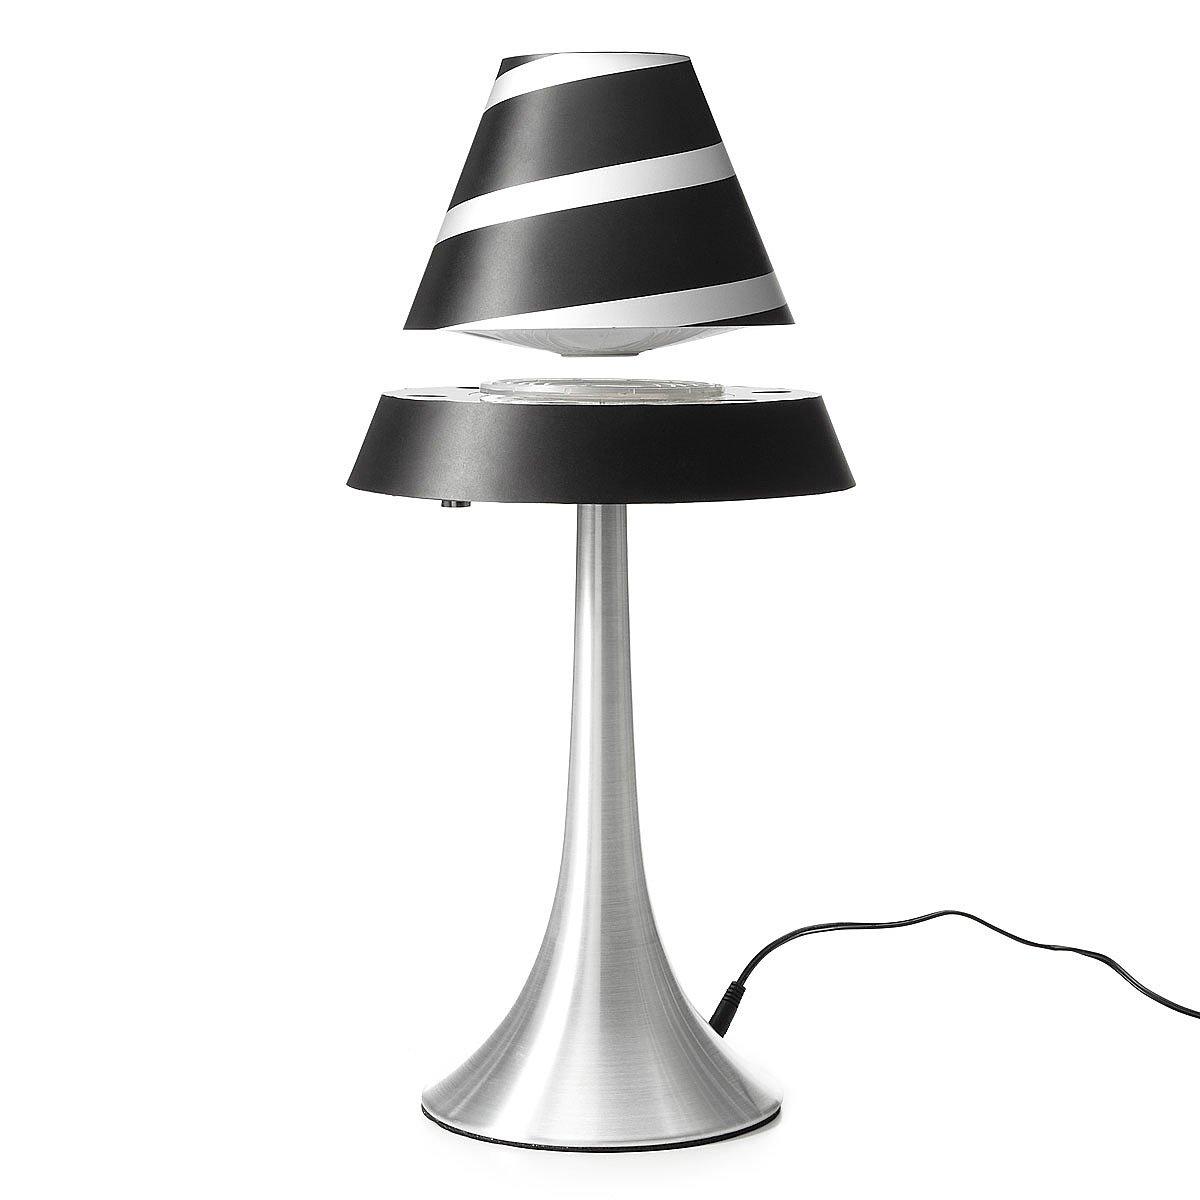 Levitron lamp floating light magic uncommongoods levitron lamp 1 thumbnail geotapseo Image collections